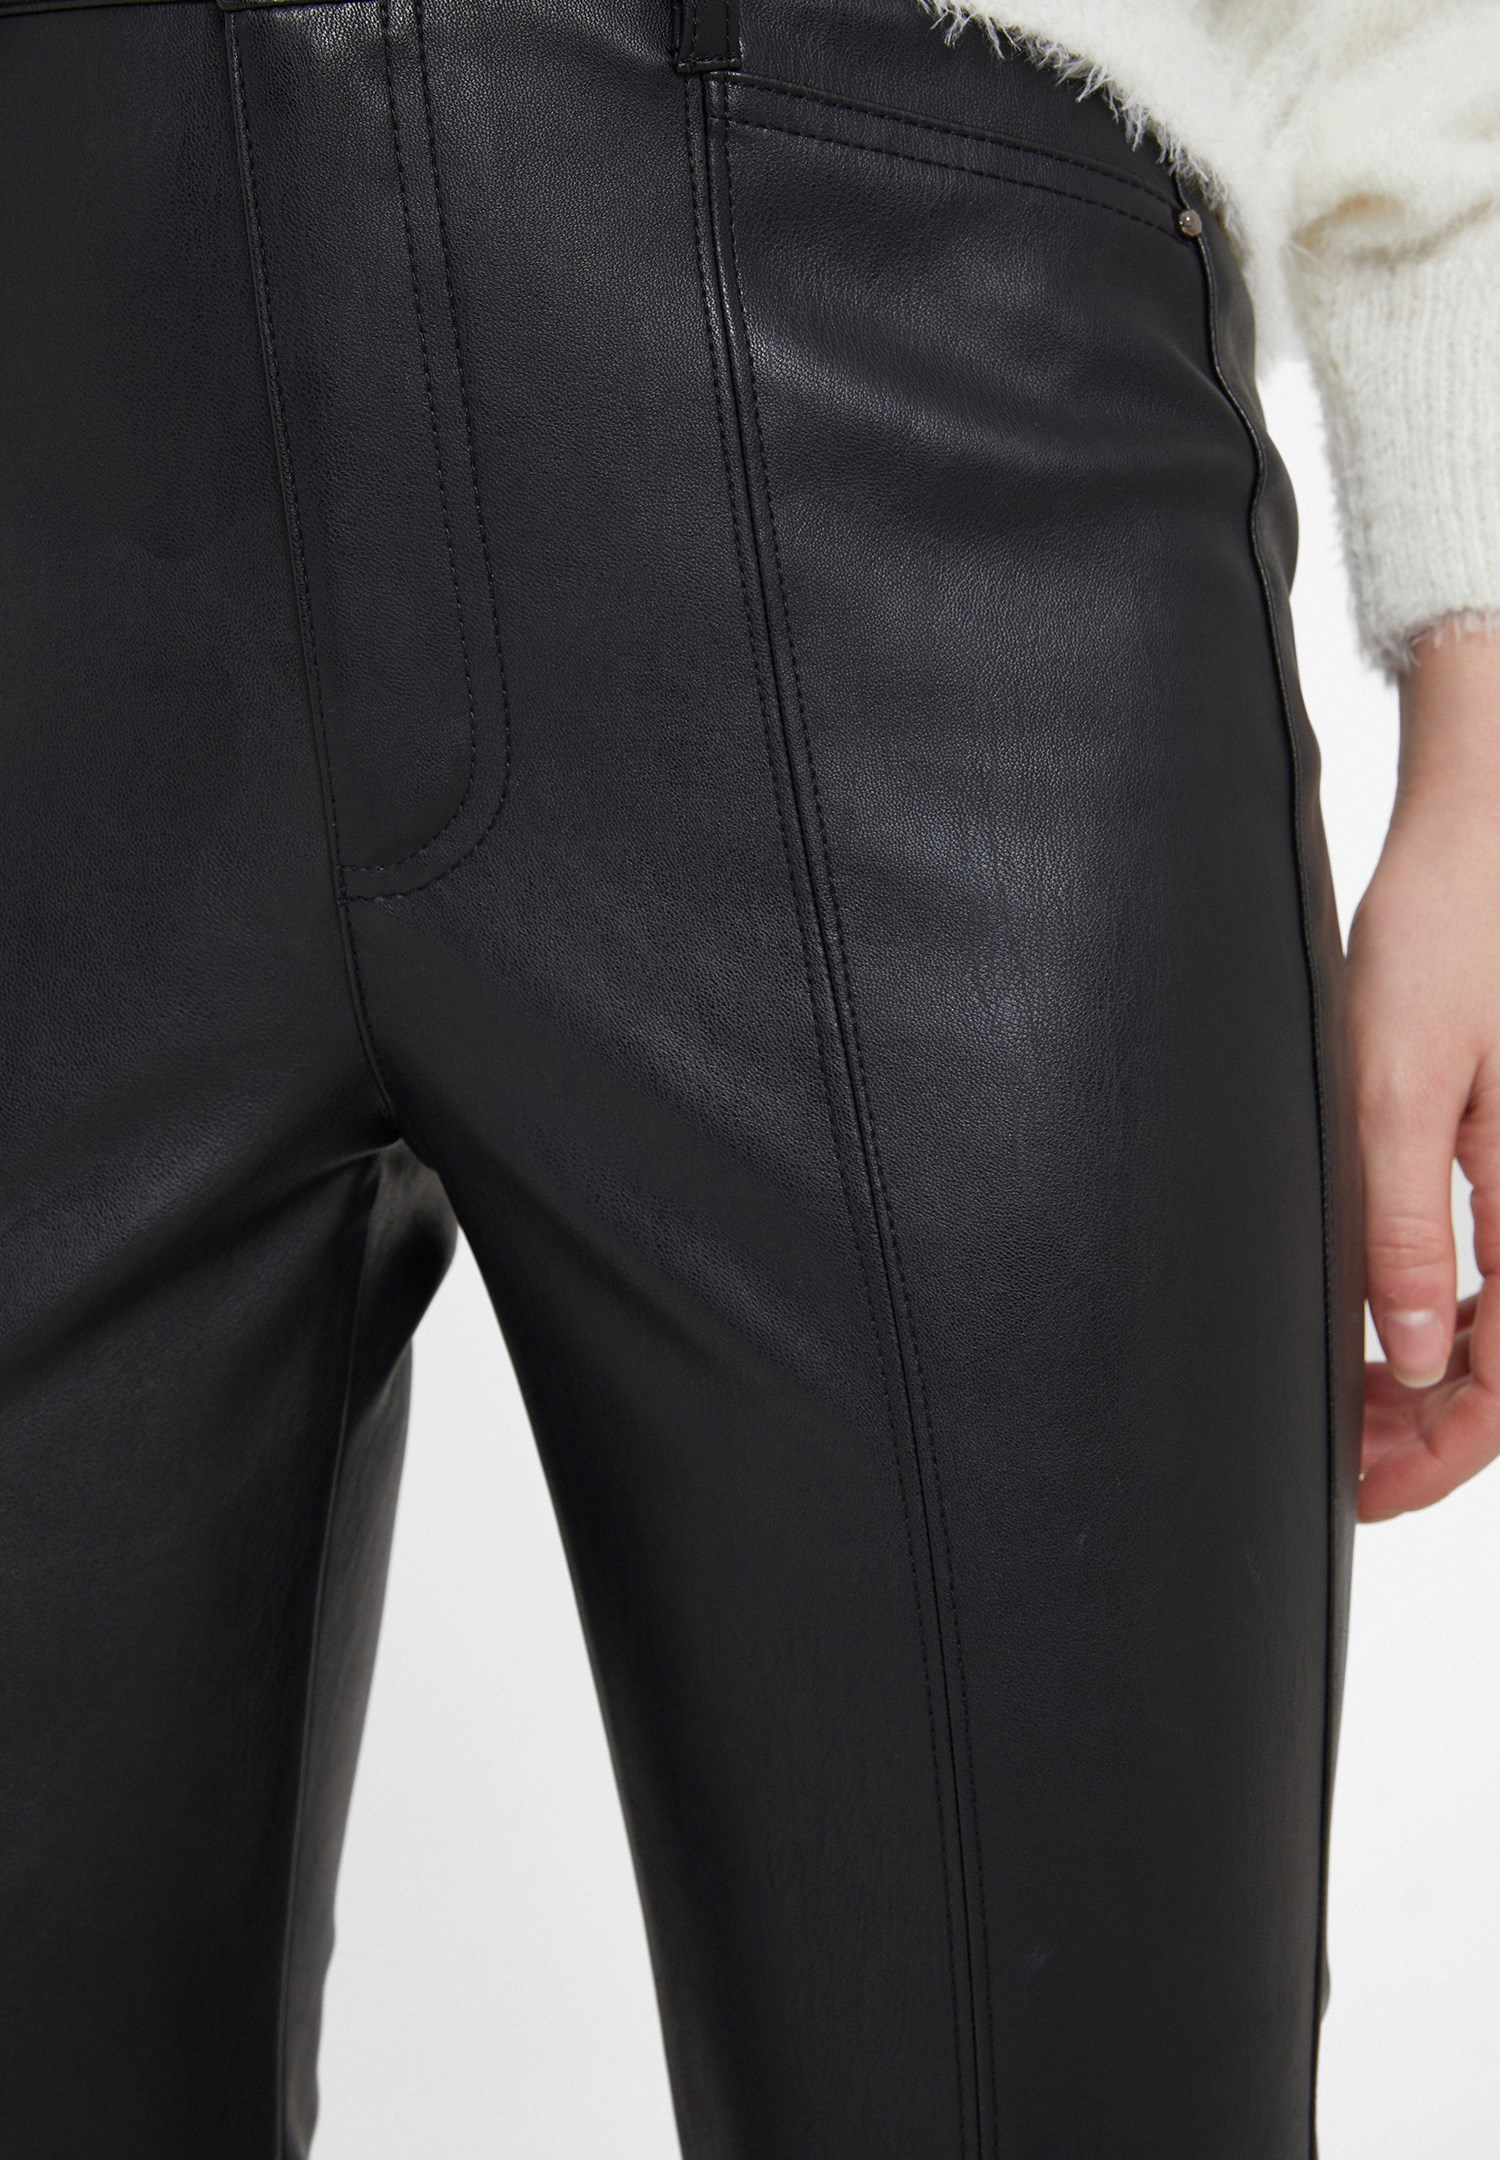 Bayan Siyah Dikiş Detaylı Suni Deri Pantolon